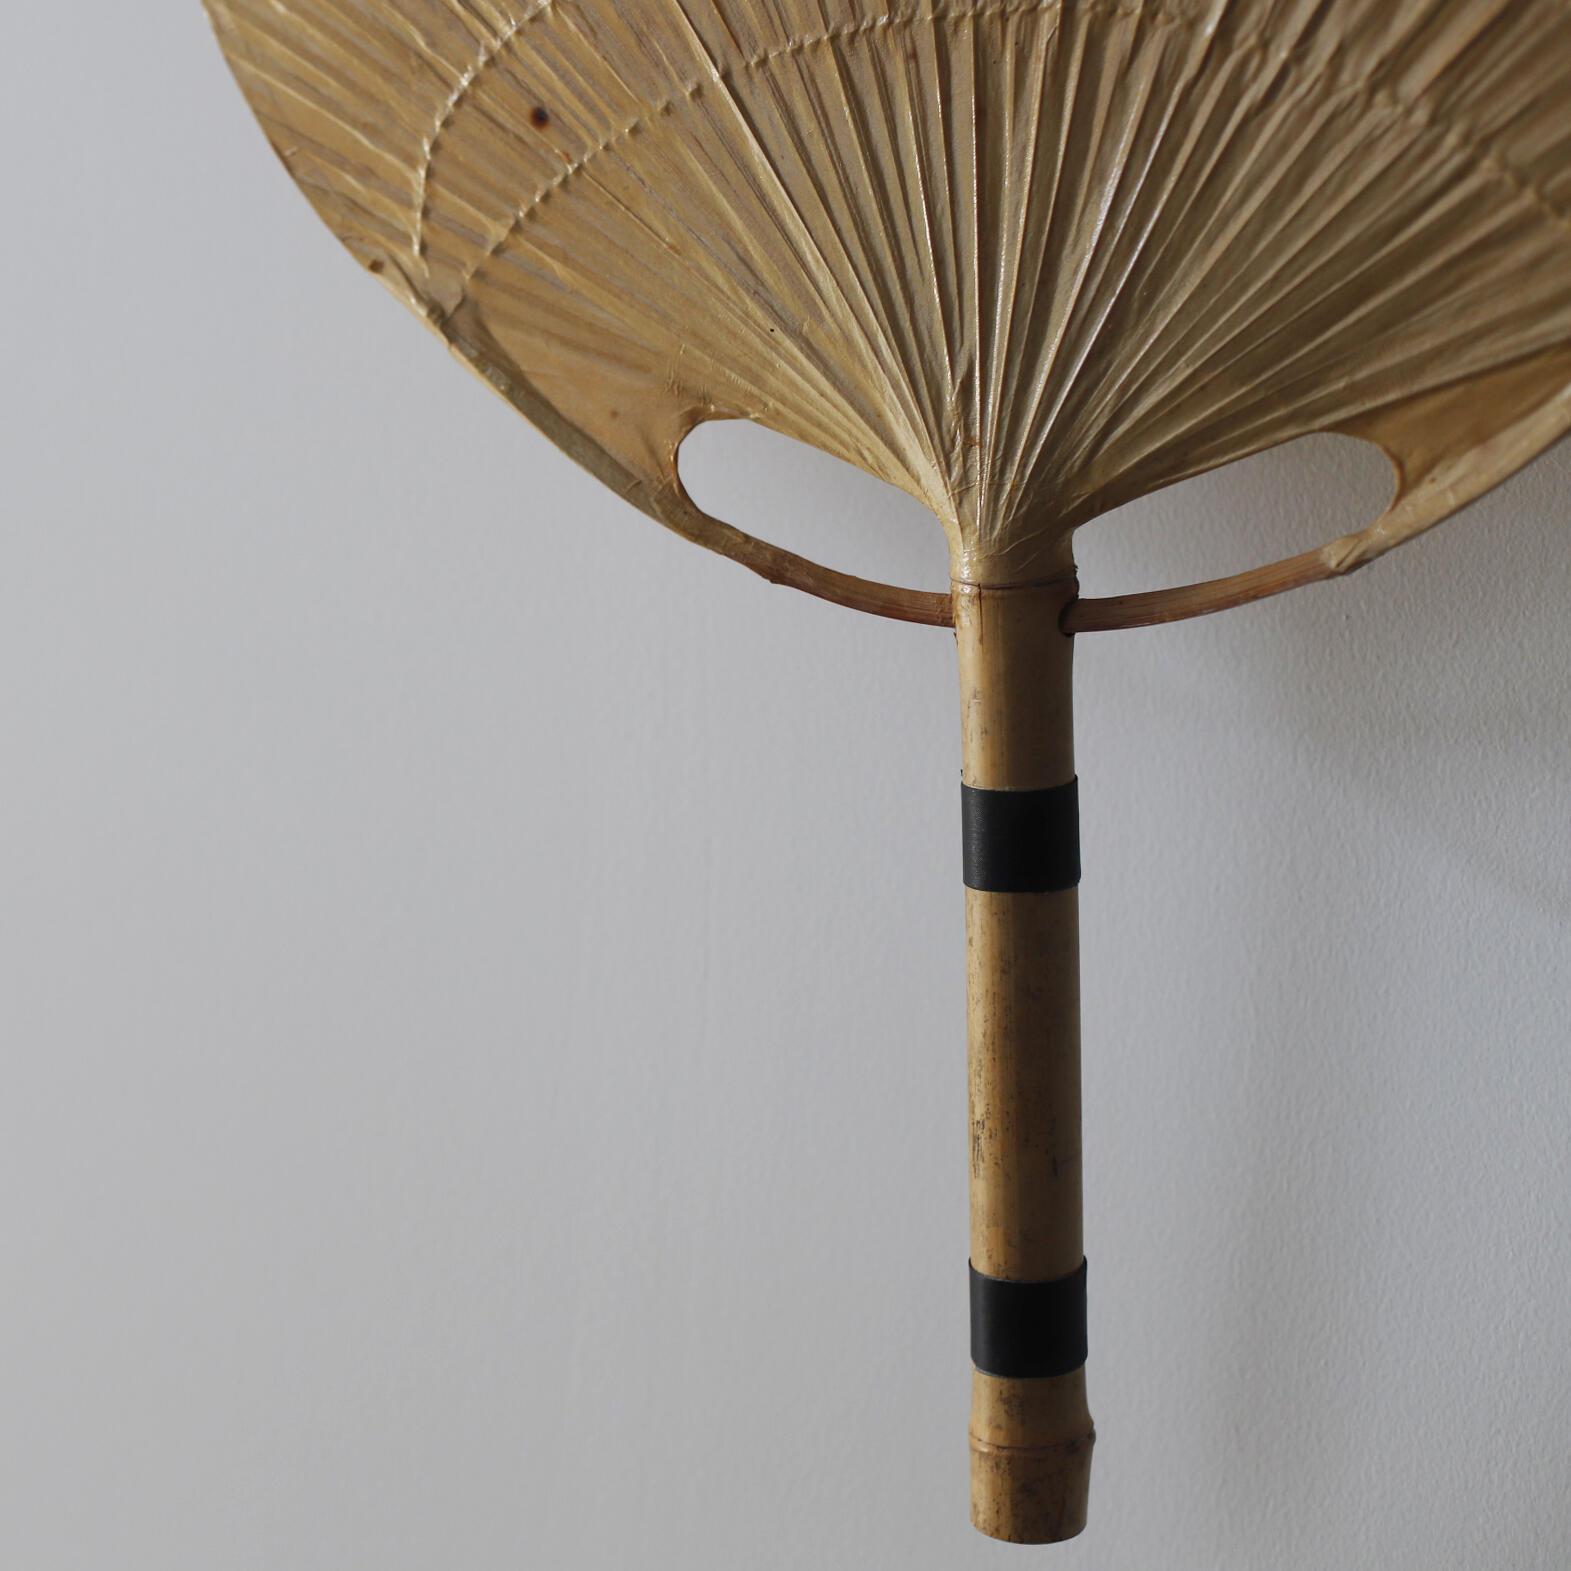 ingo maurer インゴ・マウラー 民藝 ウォールランプ